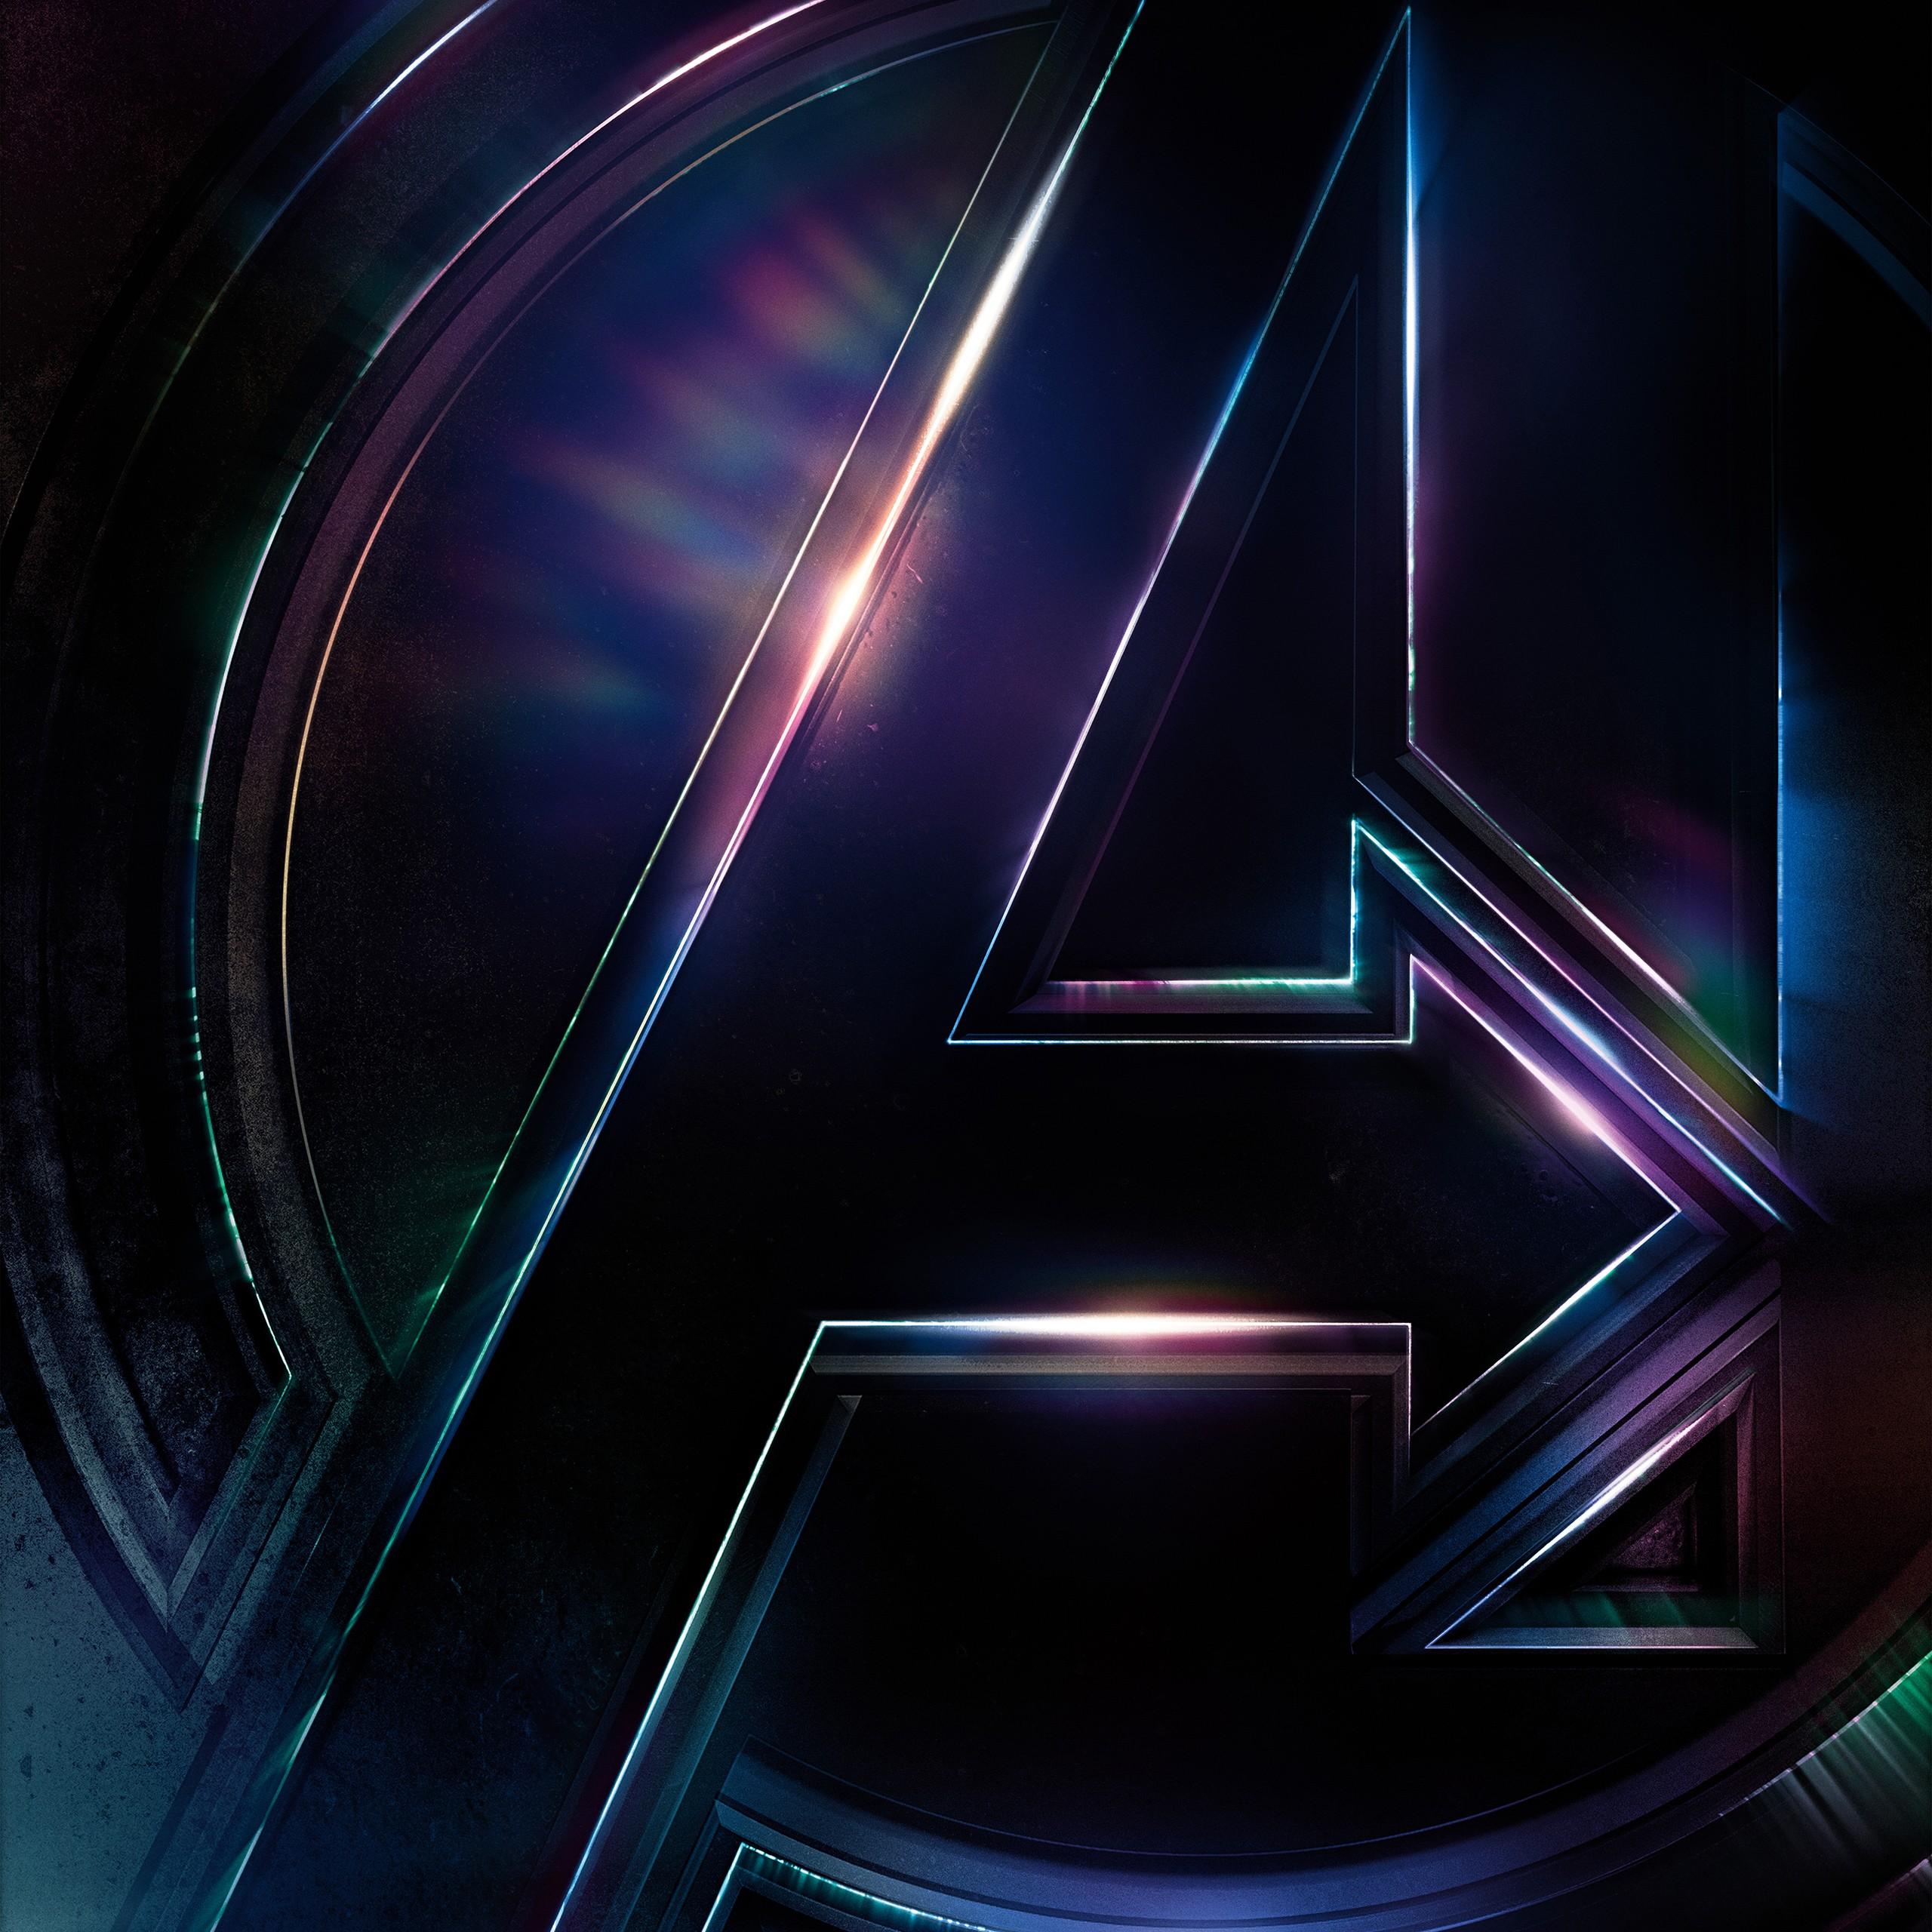 Iphone 8 Plus X Ray Wallpaper Avengers Infinity War Logo 4k Wallpapers Hd Wallpapers